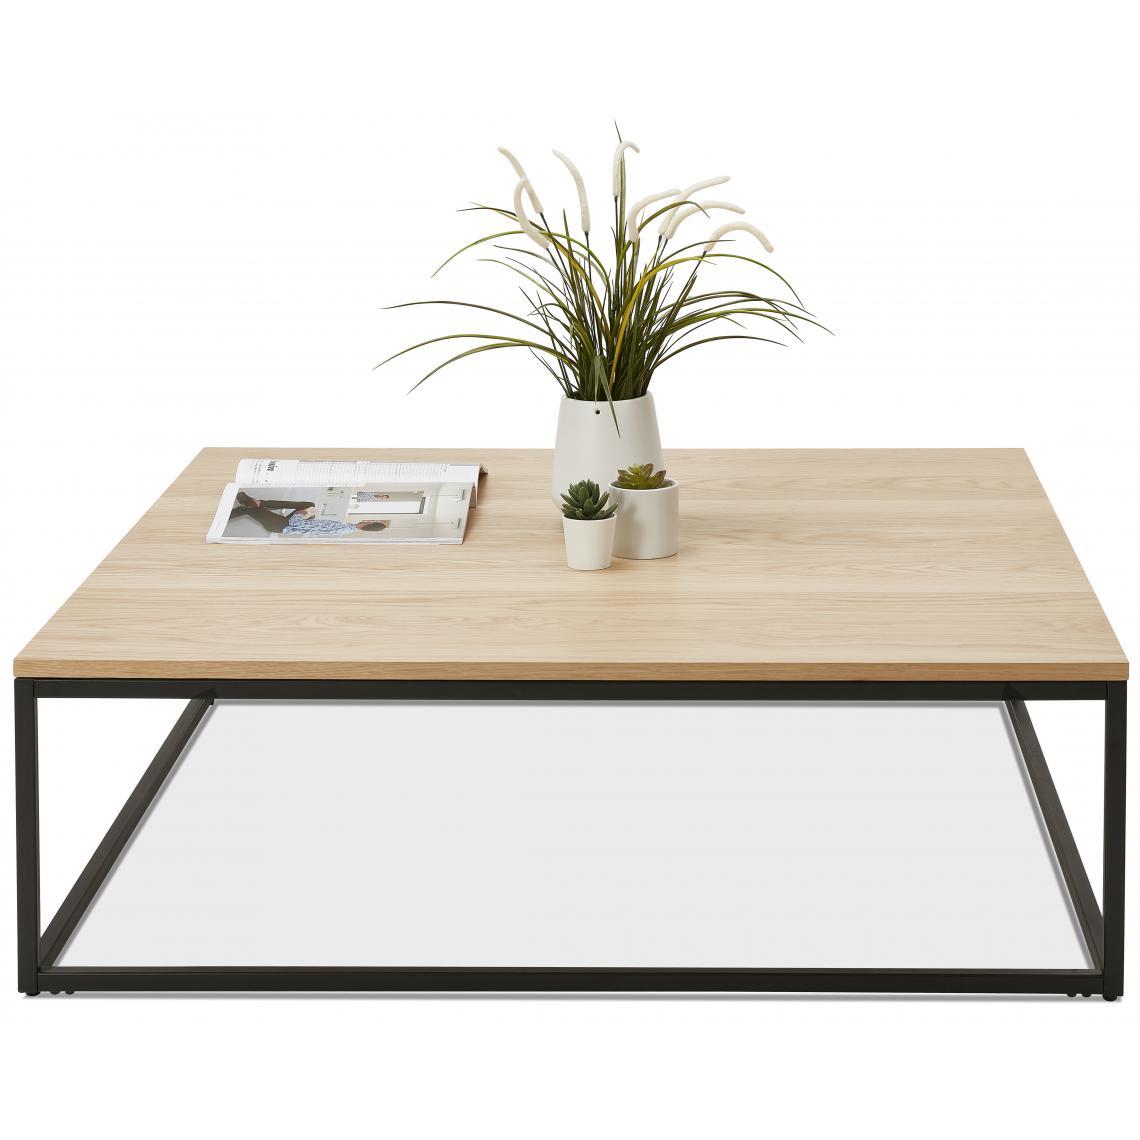 table basse carree beige et pietement